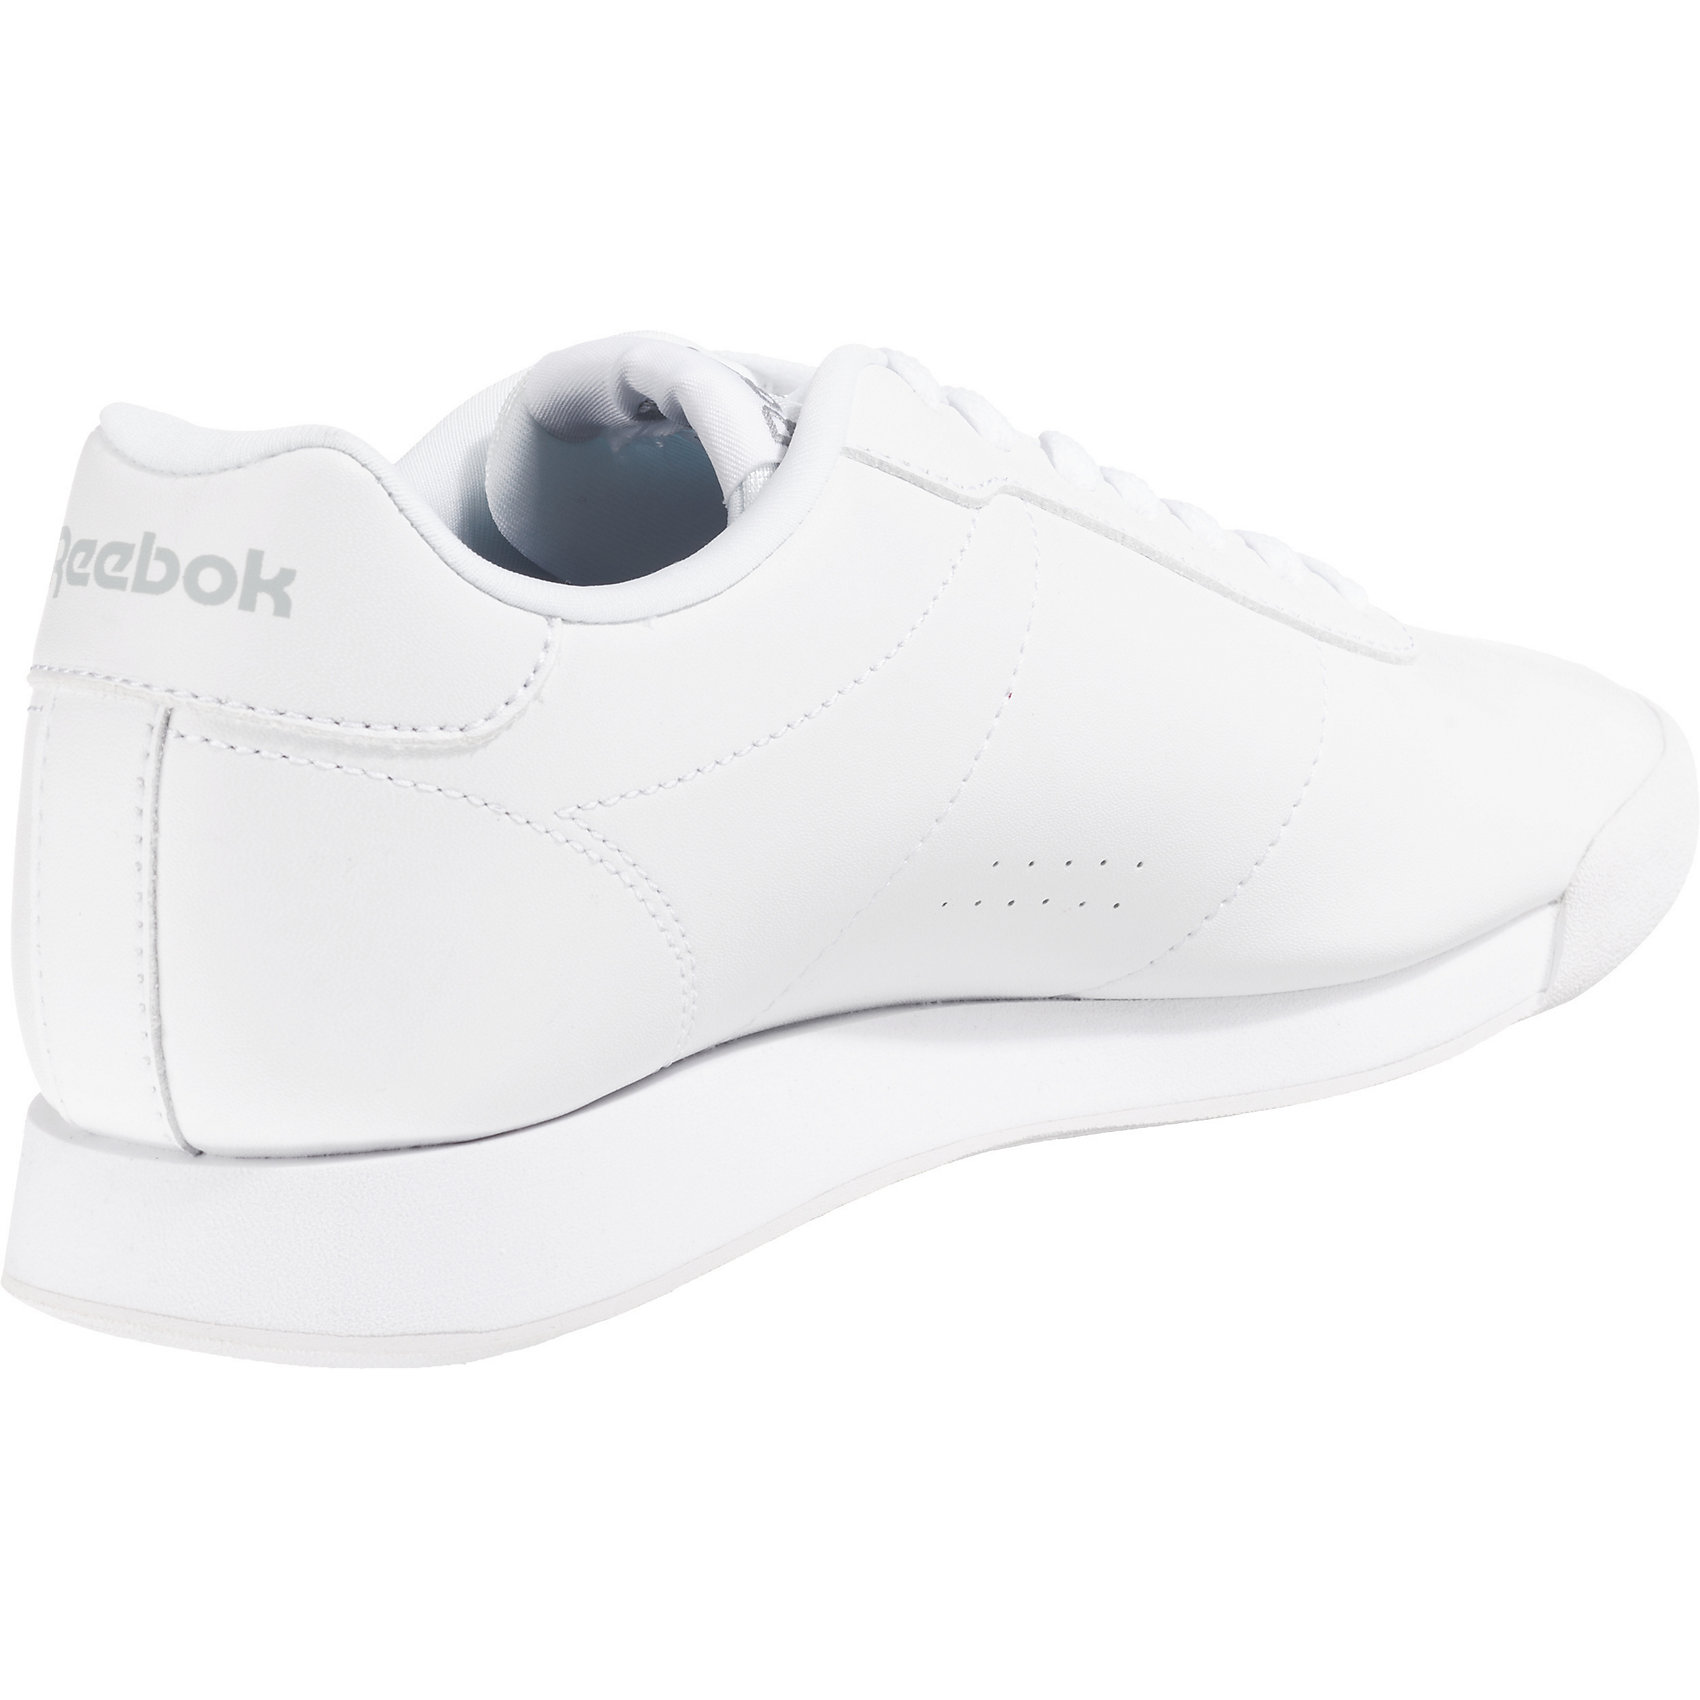 7408160 Kombi Reebok Weiß Für Royal Low Zu Charm Details Sneakers Neu Damen 2WED9HI